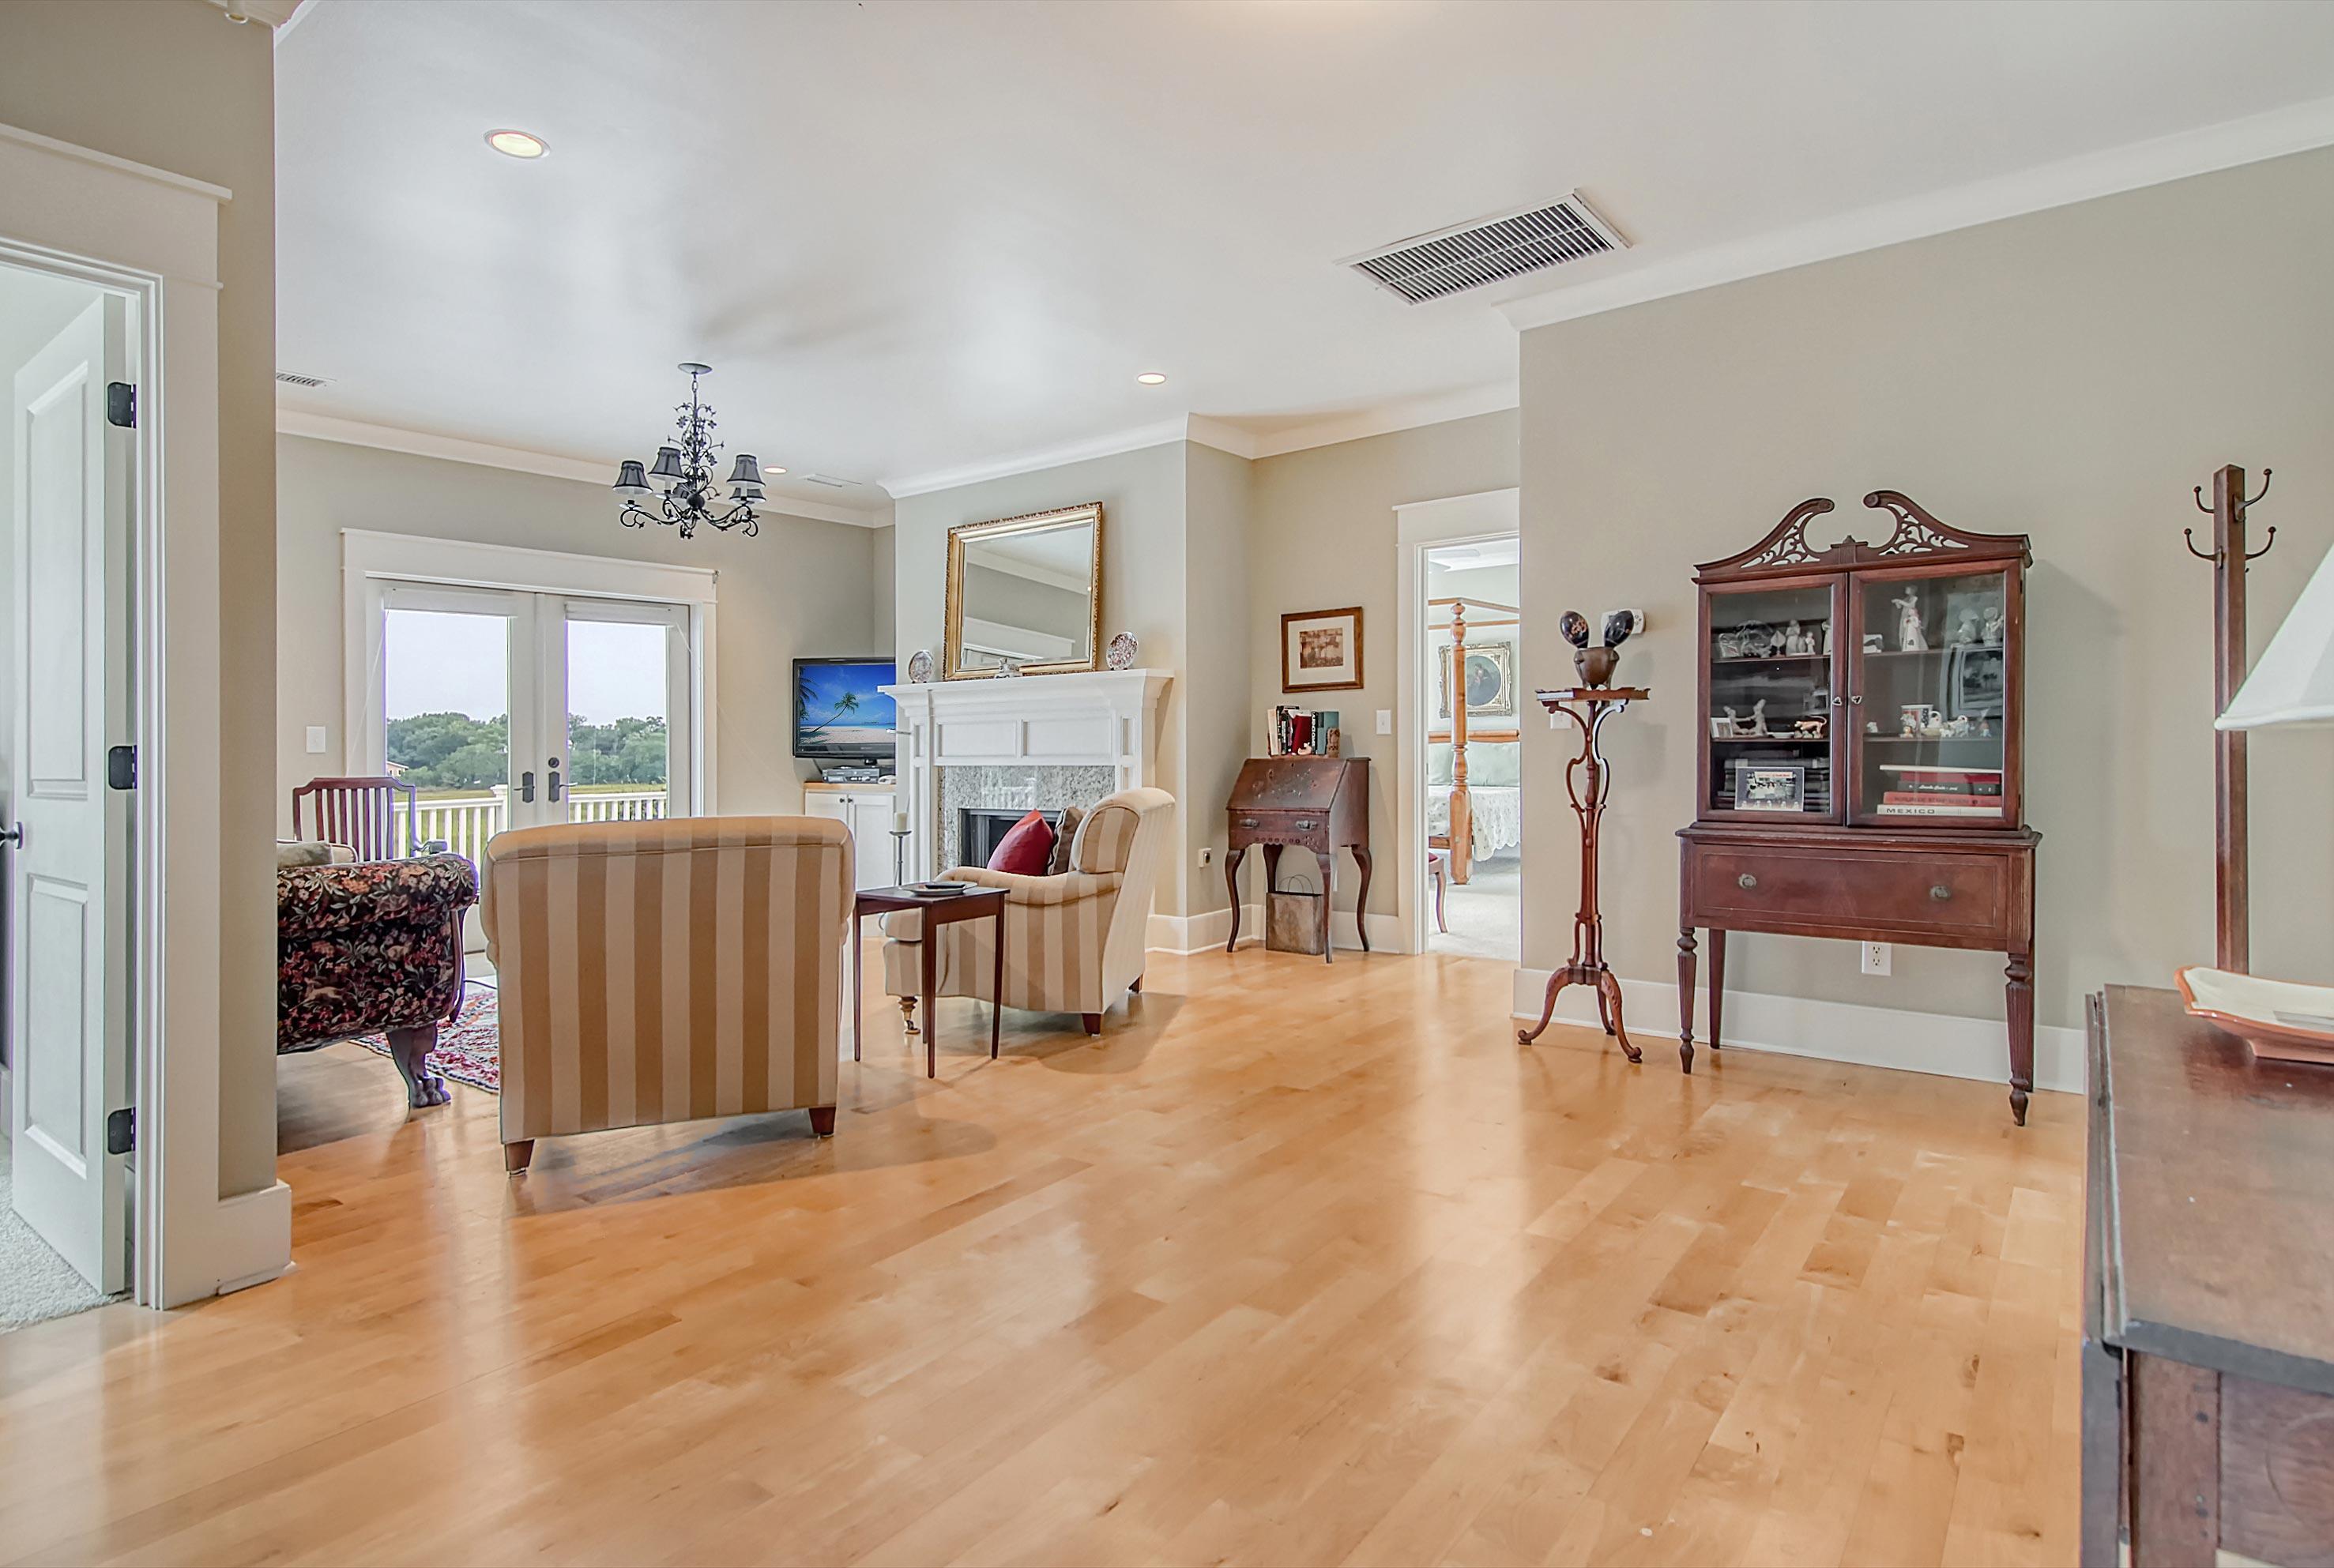 Scanlonville Homes For Sale - 152 6th, Mount Pleasant, SC - 69